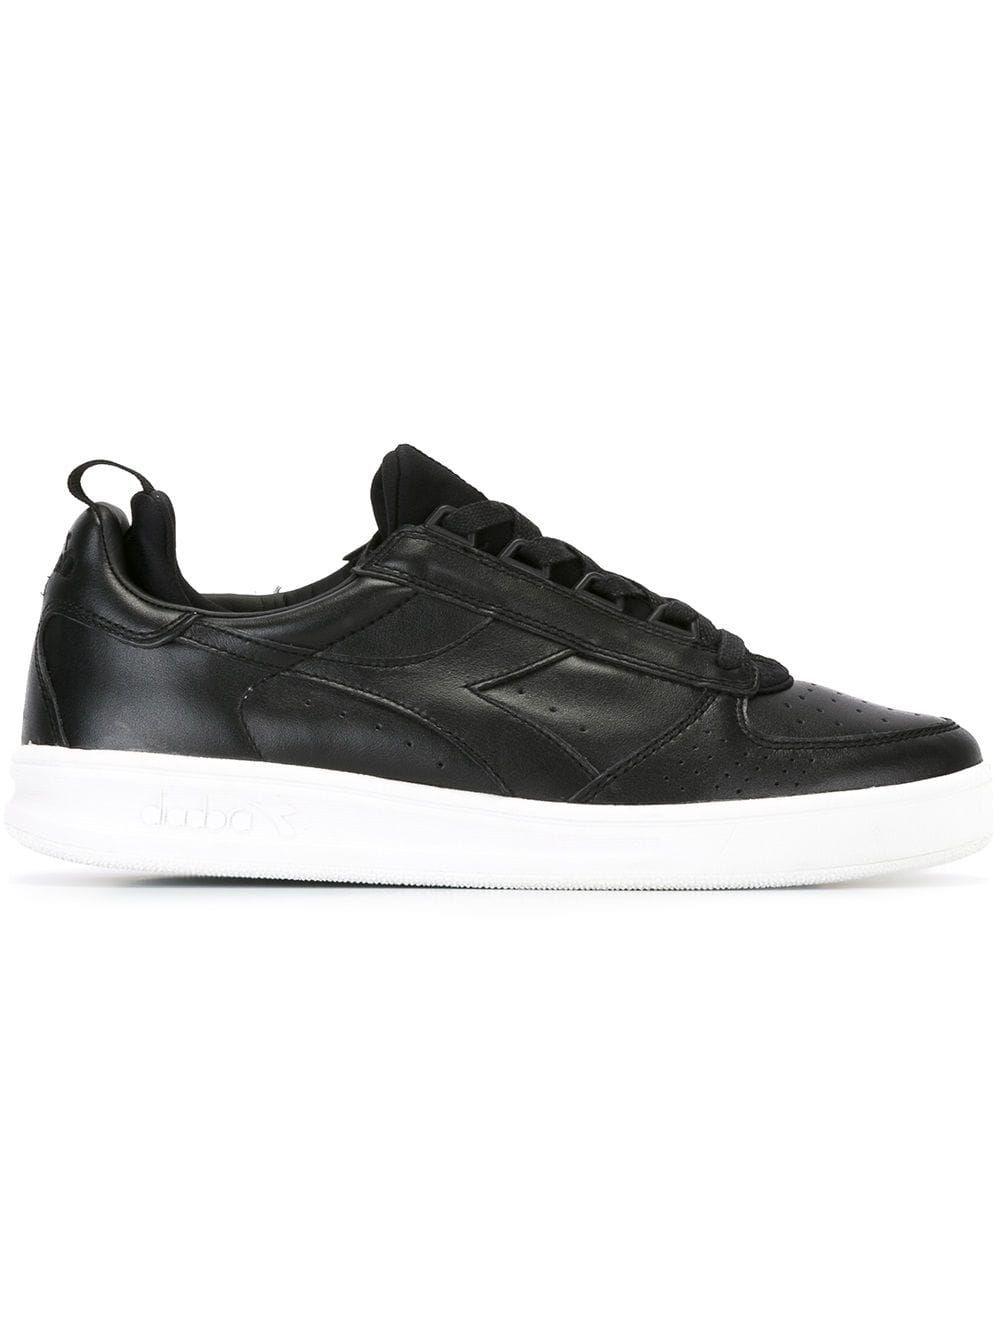 Diadora Lace-up Sneakers - Black | ModeSens